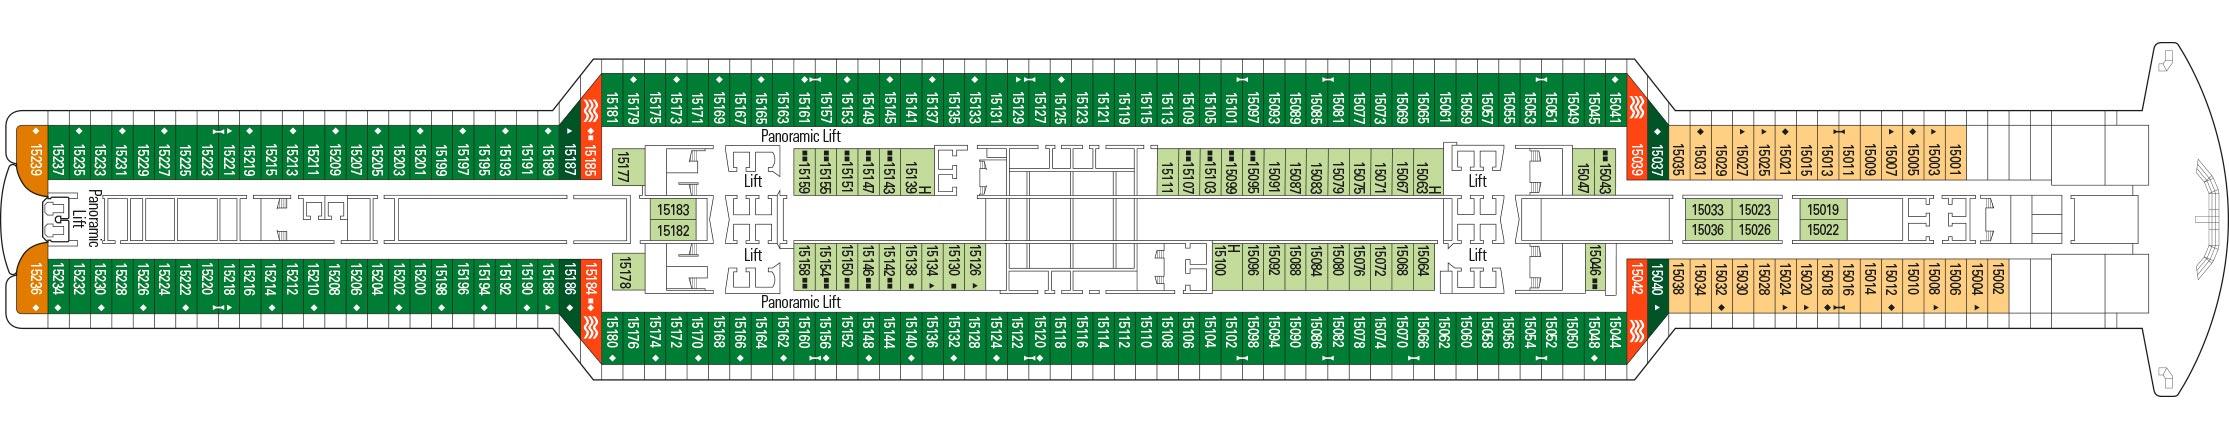 MSC Cruises MSC Seaview Deckplans Deck 15.jpg